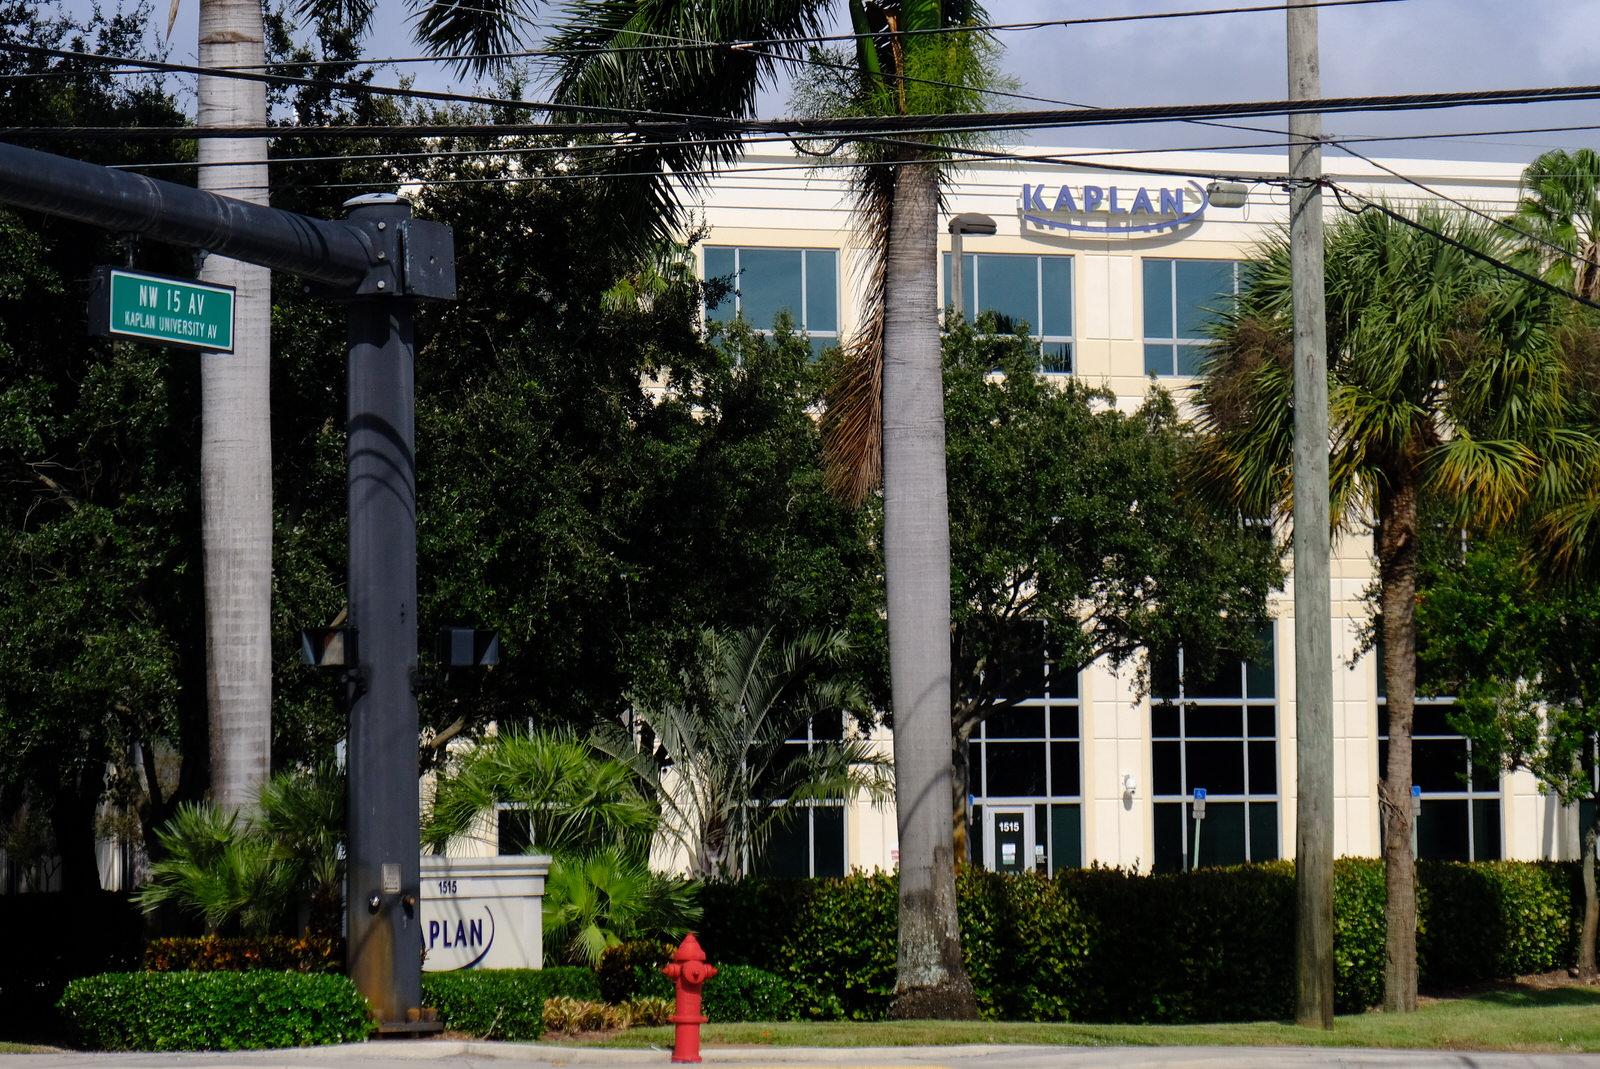 Kaplan's corporate headquarters in Fort Lauderdale, Florida.